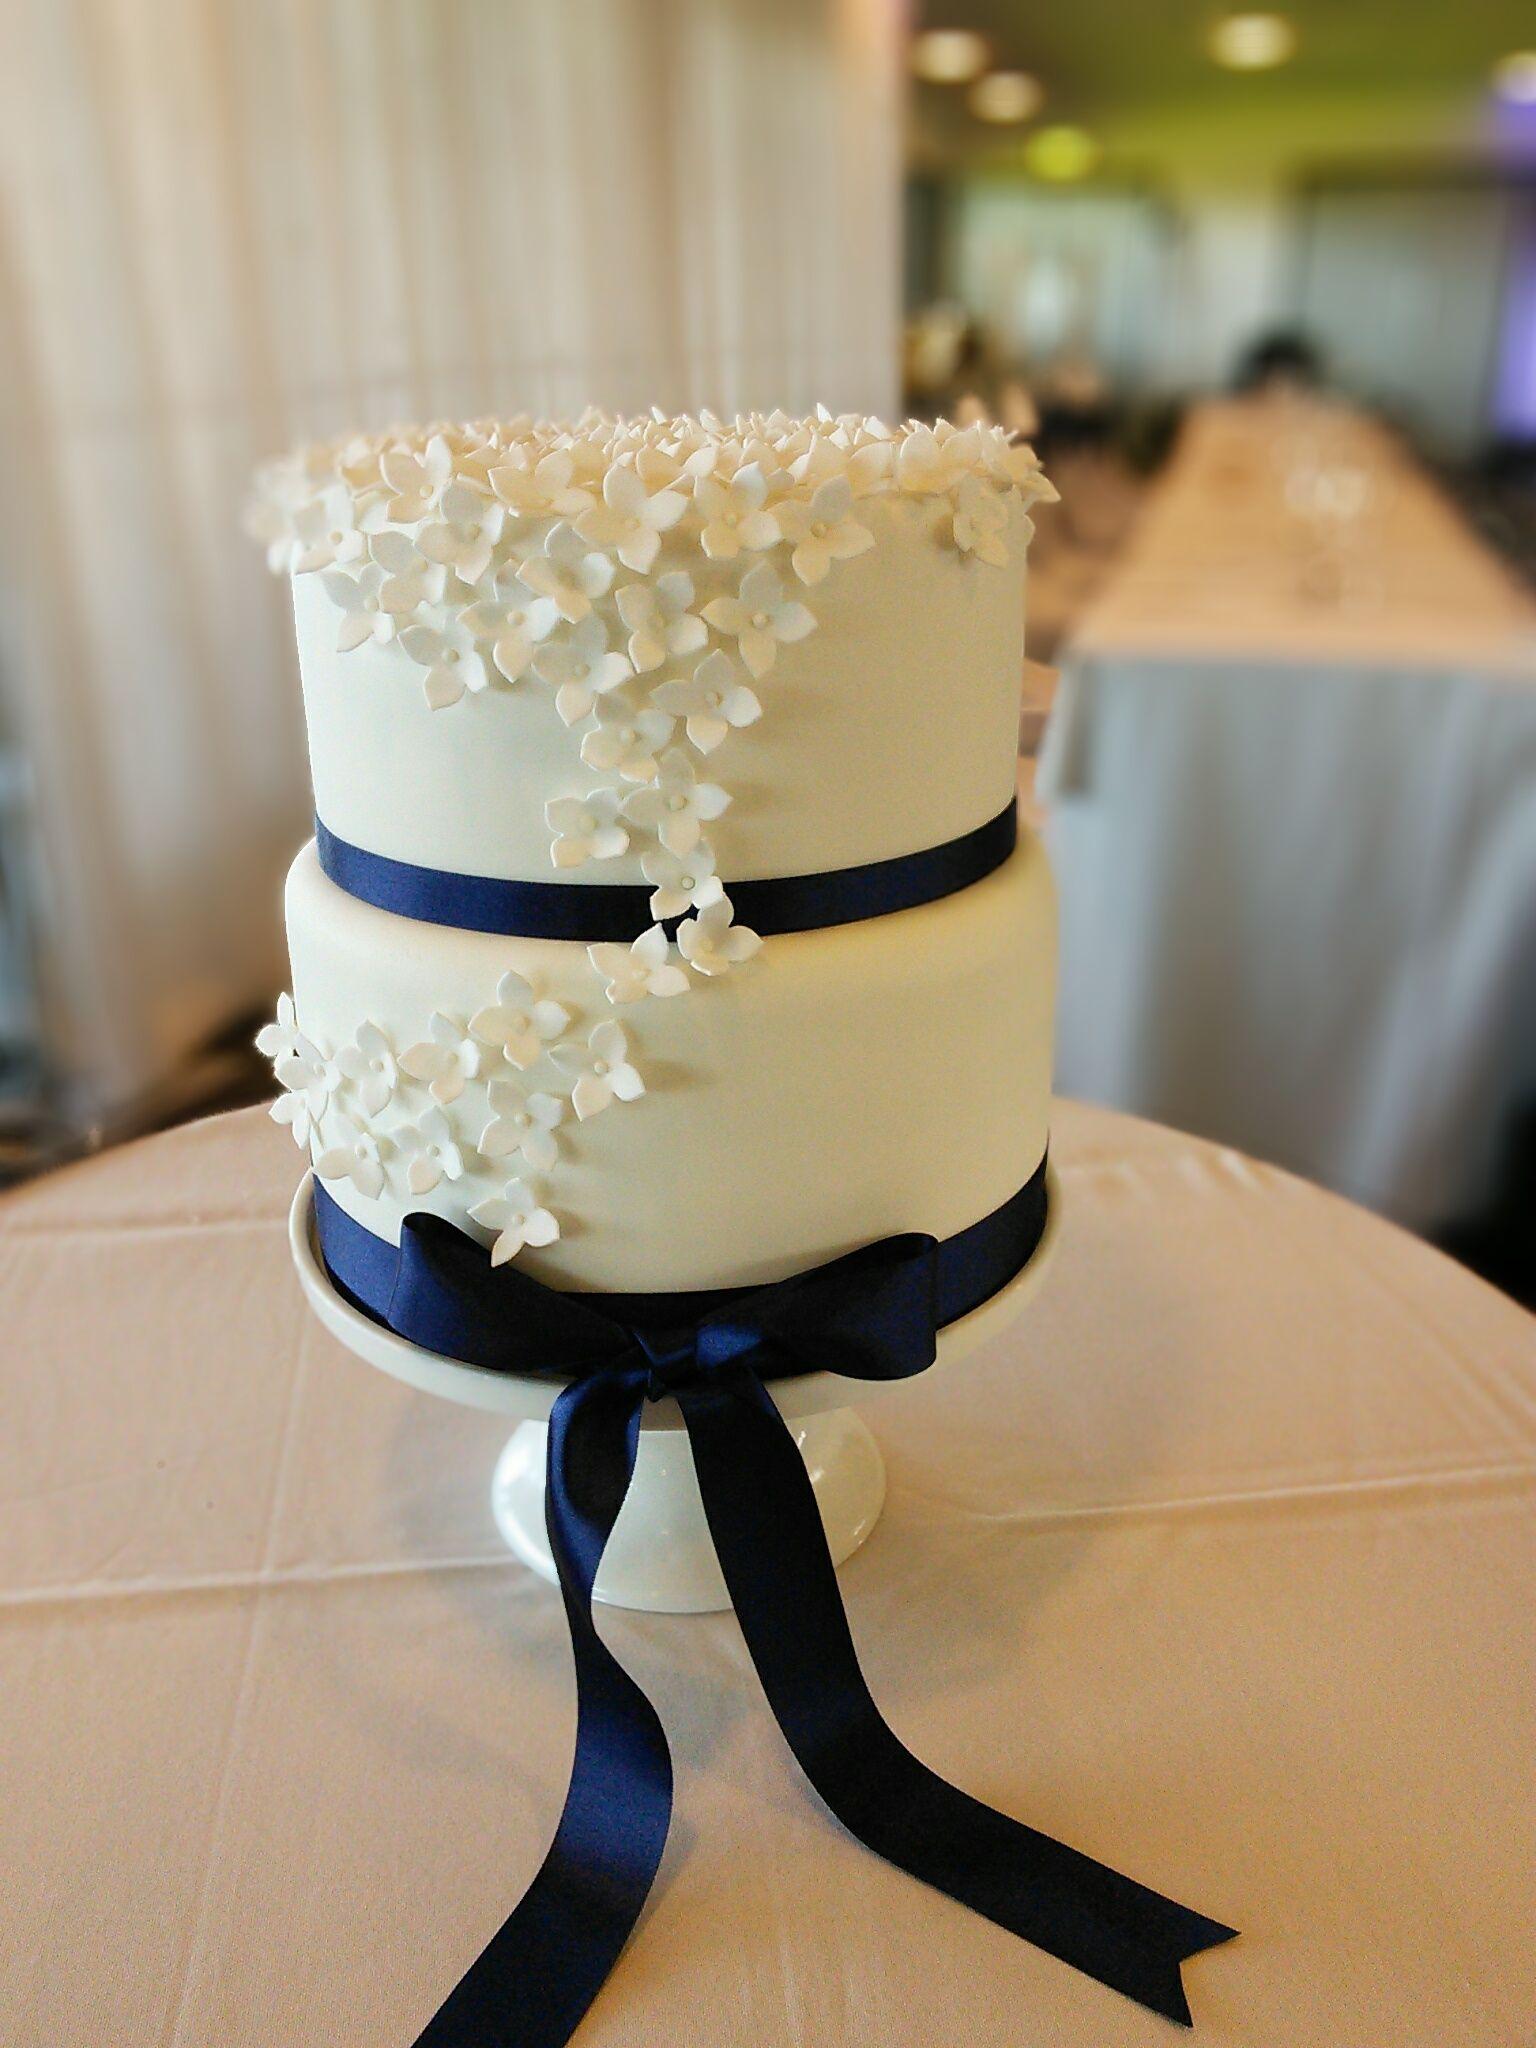 Navy Blue And White 2 Tier Wedding Cake Wedding Cake Navy Navy Blue Wedding Cakes 2 Tier Wedding Cakes